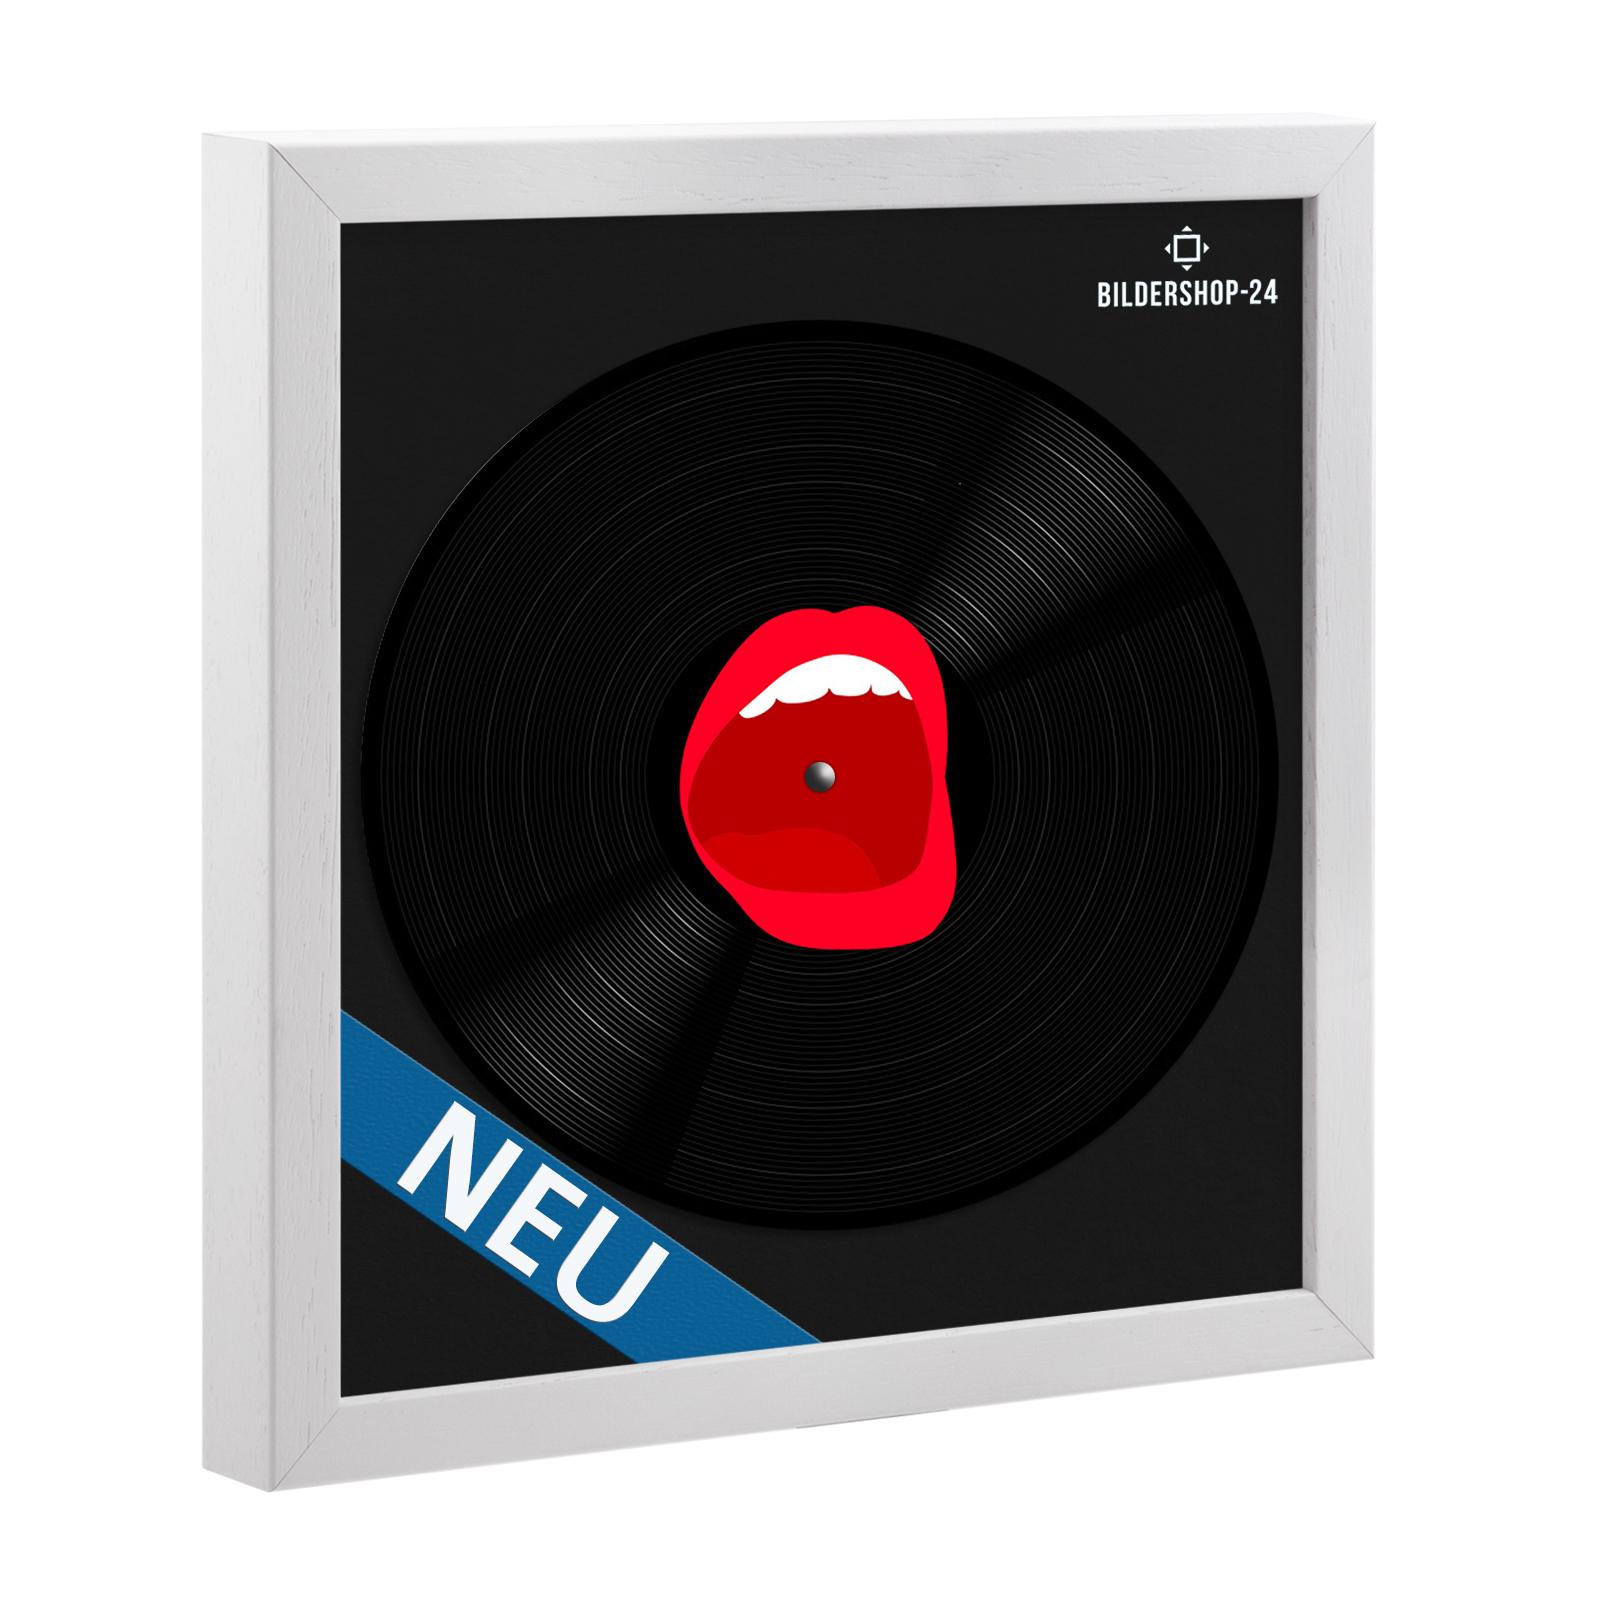 Deko - 3d-/objektrahmen aus Holz günstig kaufen | eBay